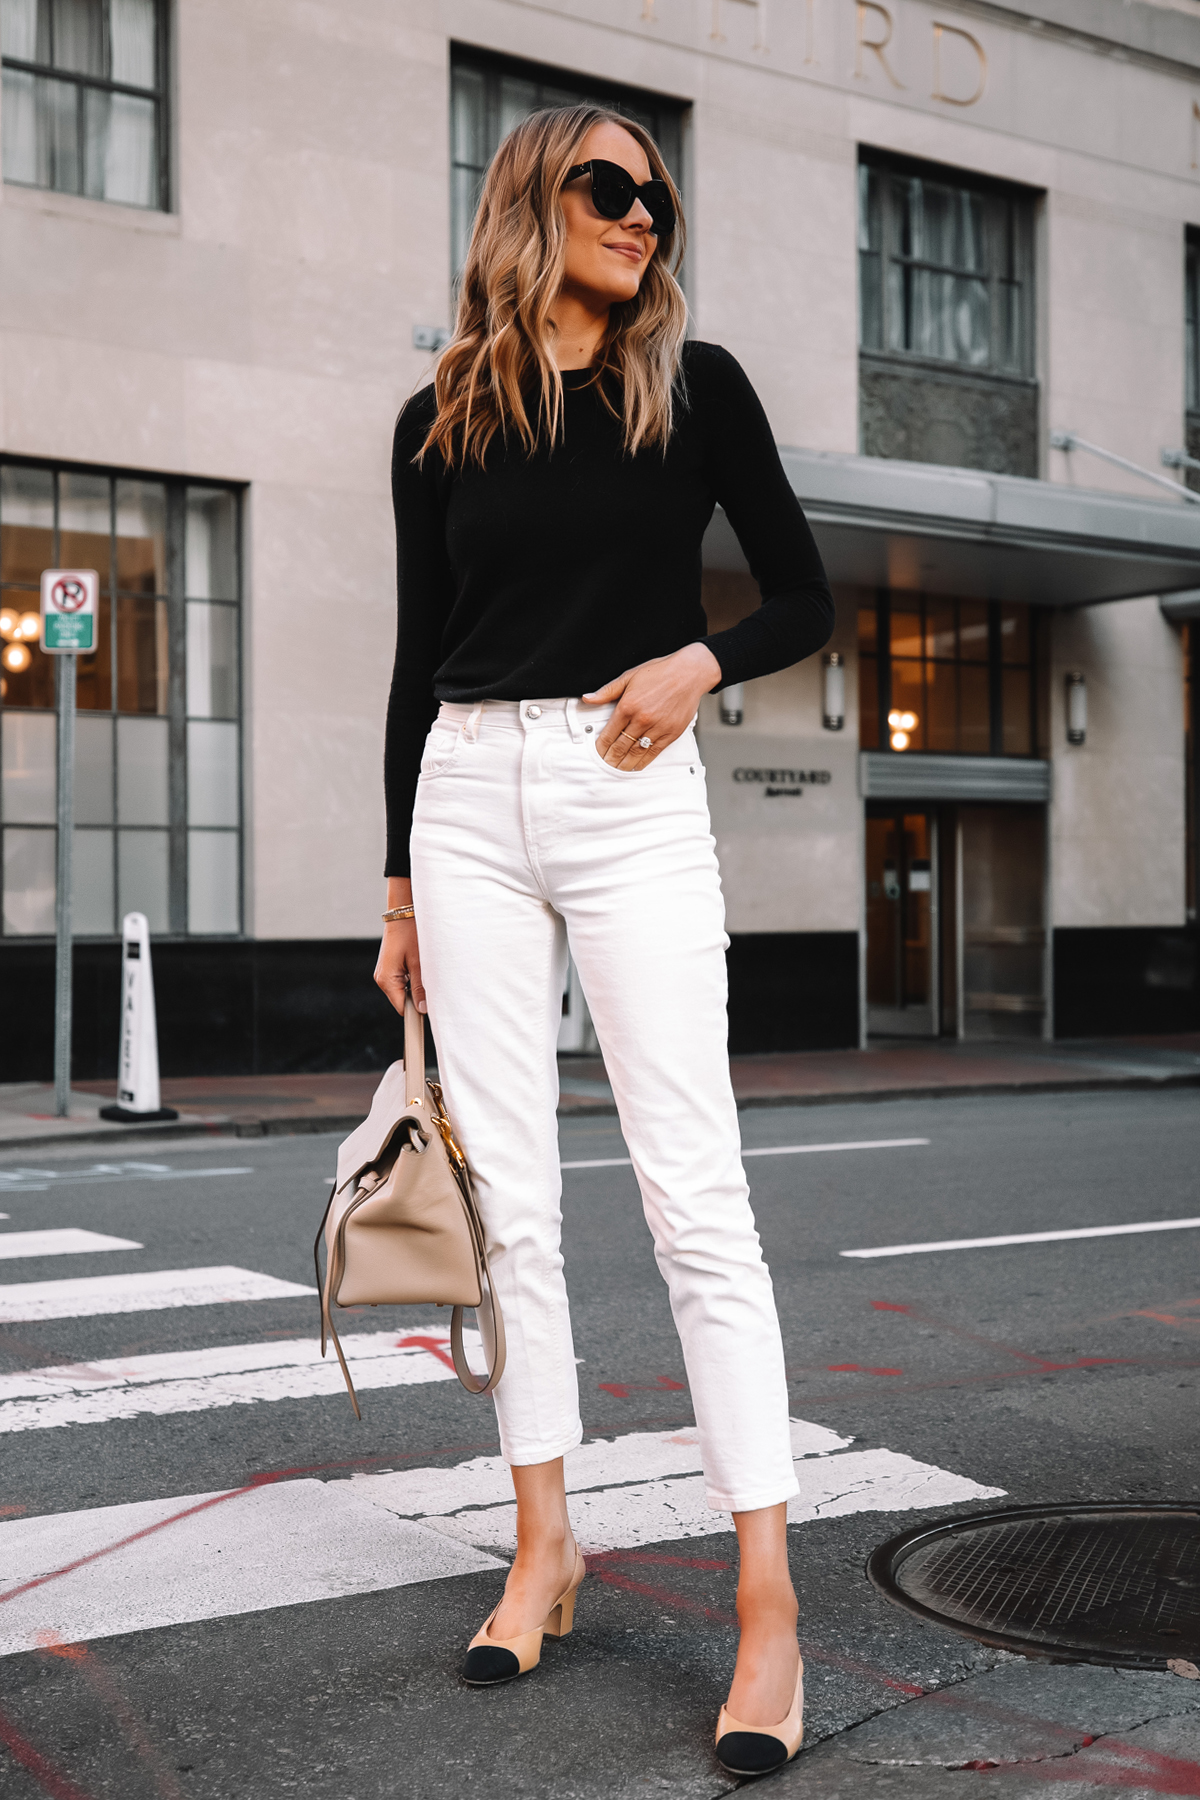 Fashion Jackson Wearing Everlane Black Cashmere Sweater Everlane White Jeans Chanel Slingbacks Celine Belt Bag Street Style 3